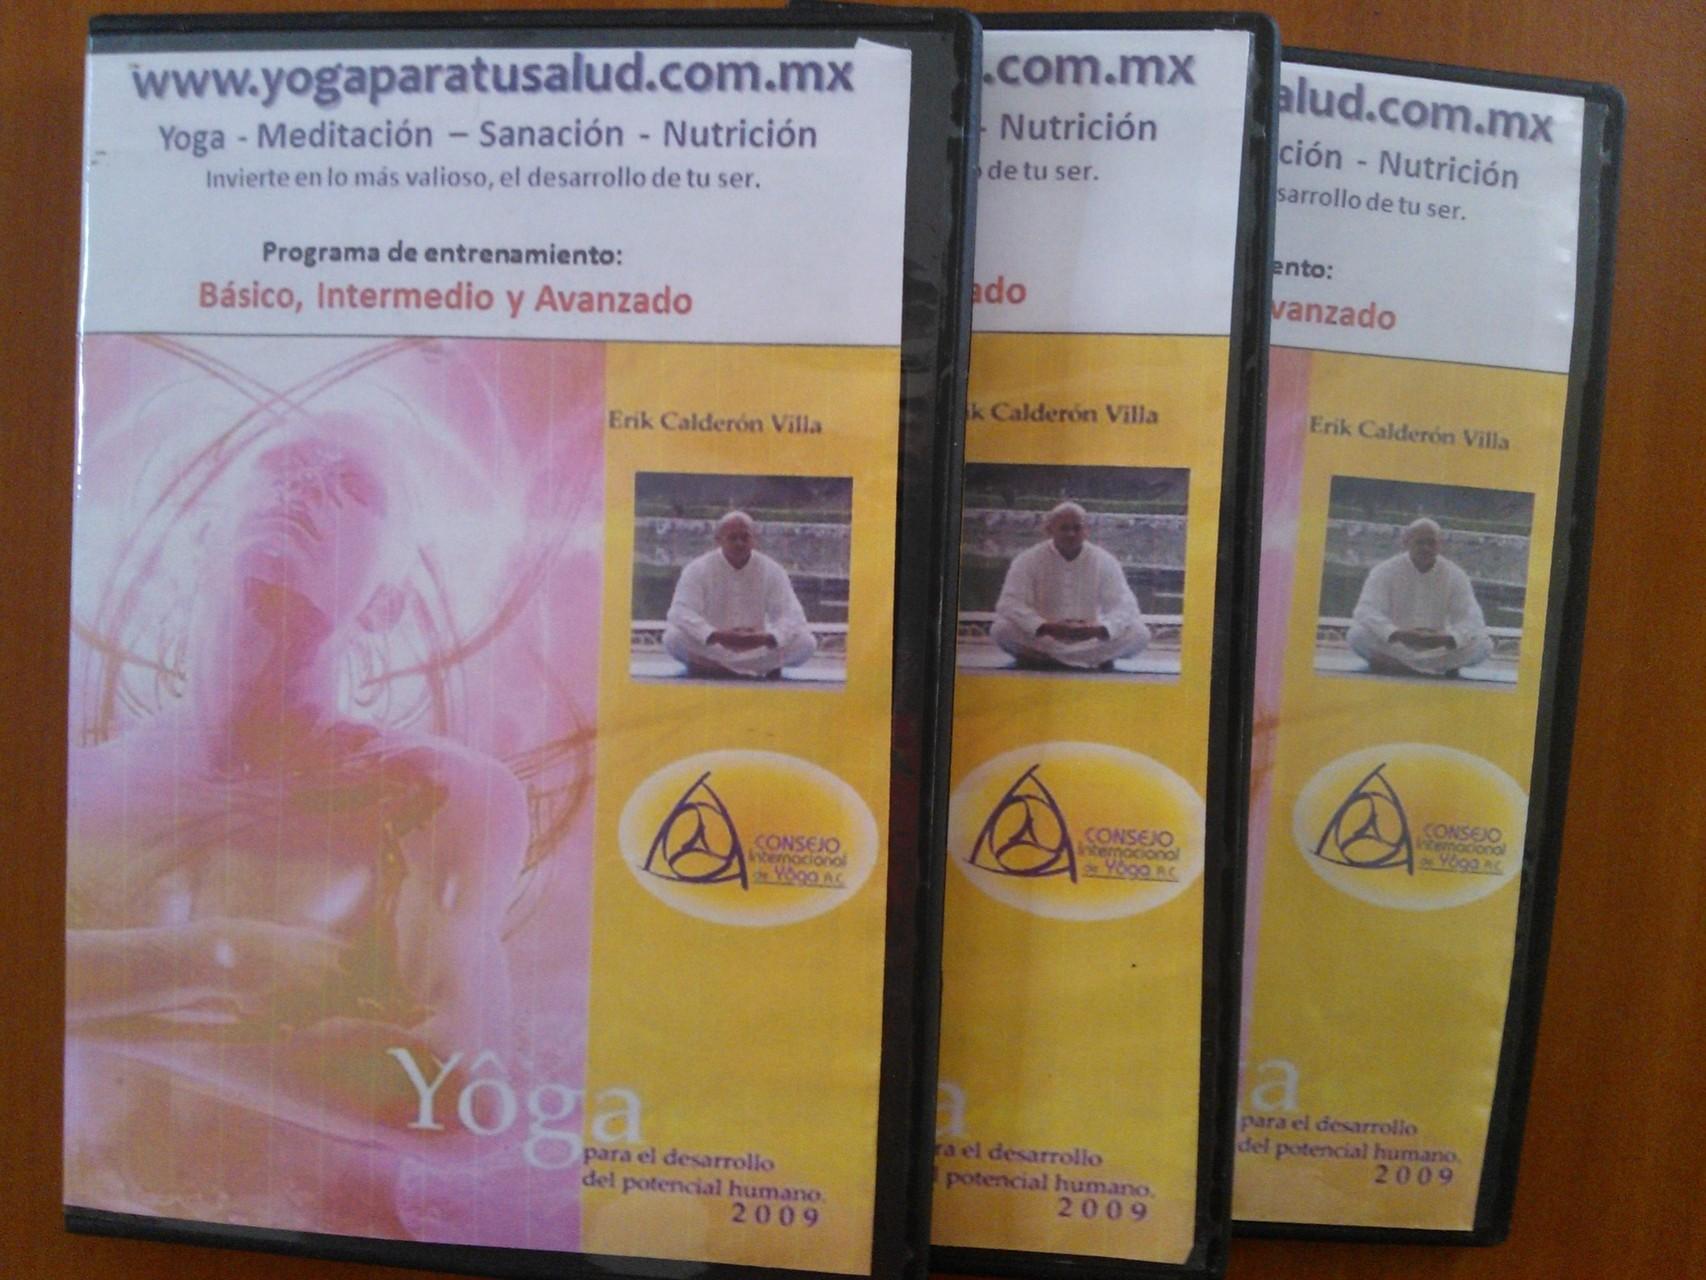 DVD´s Yoga $500, Incluye envío en México.